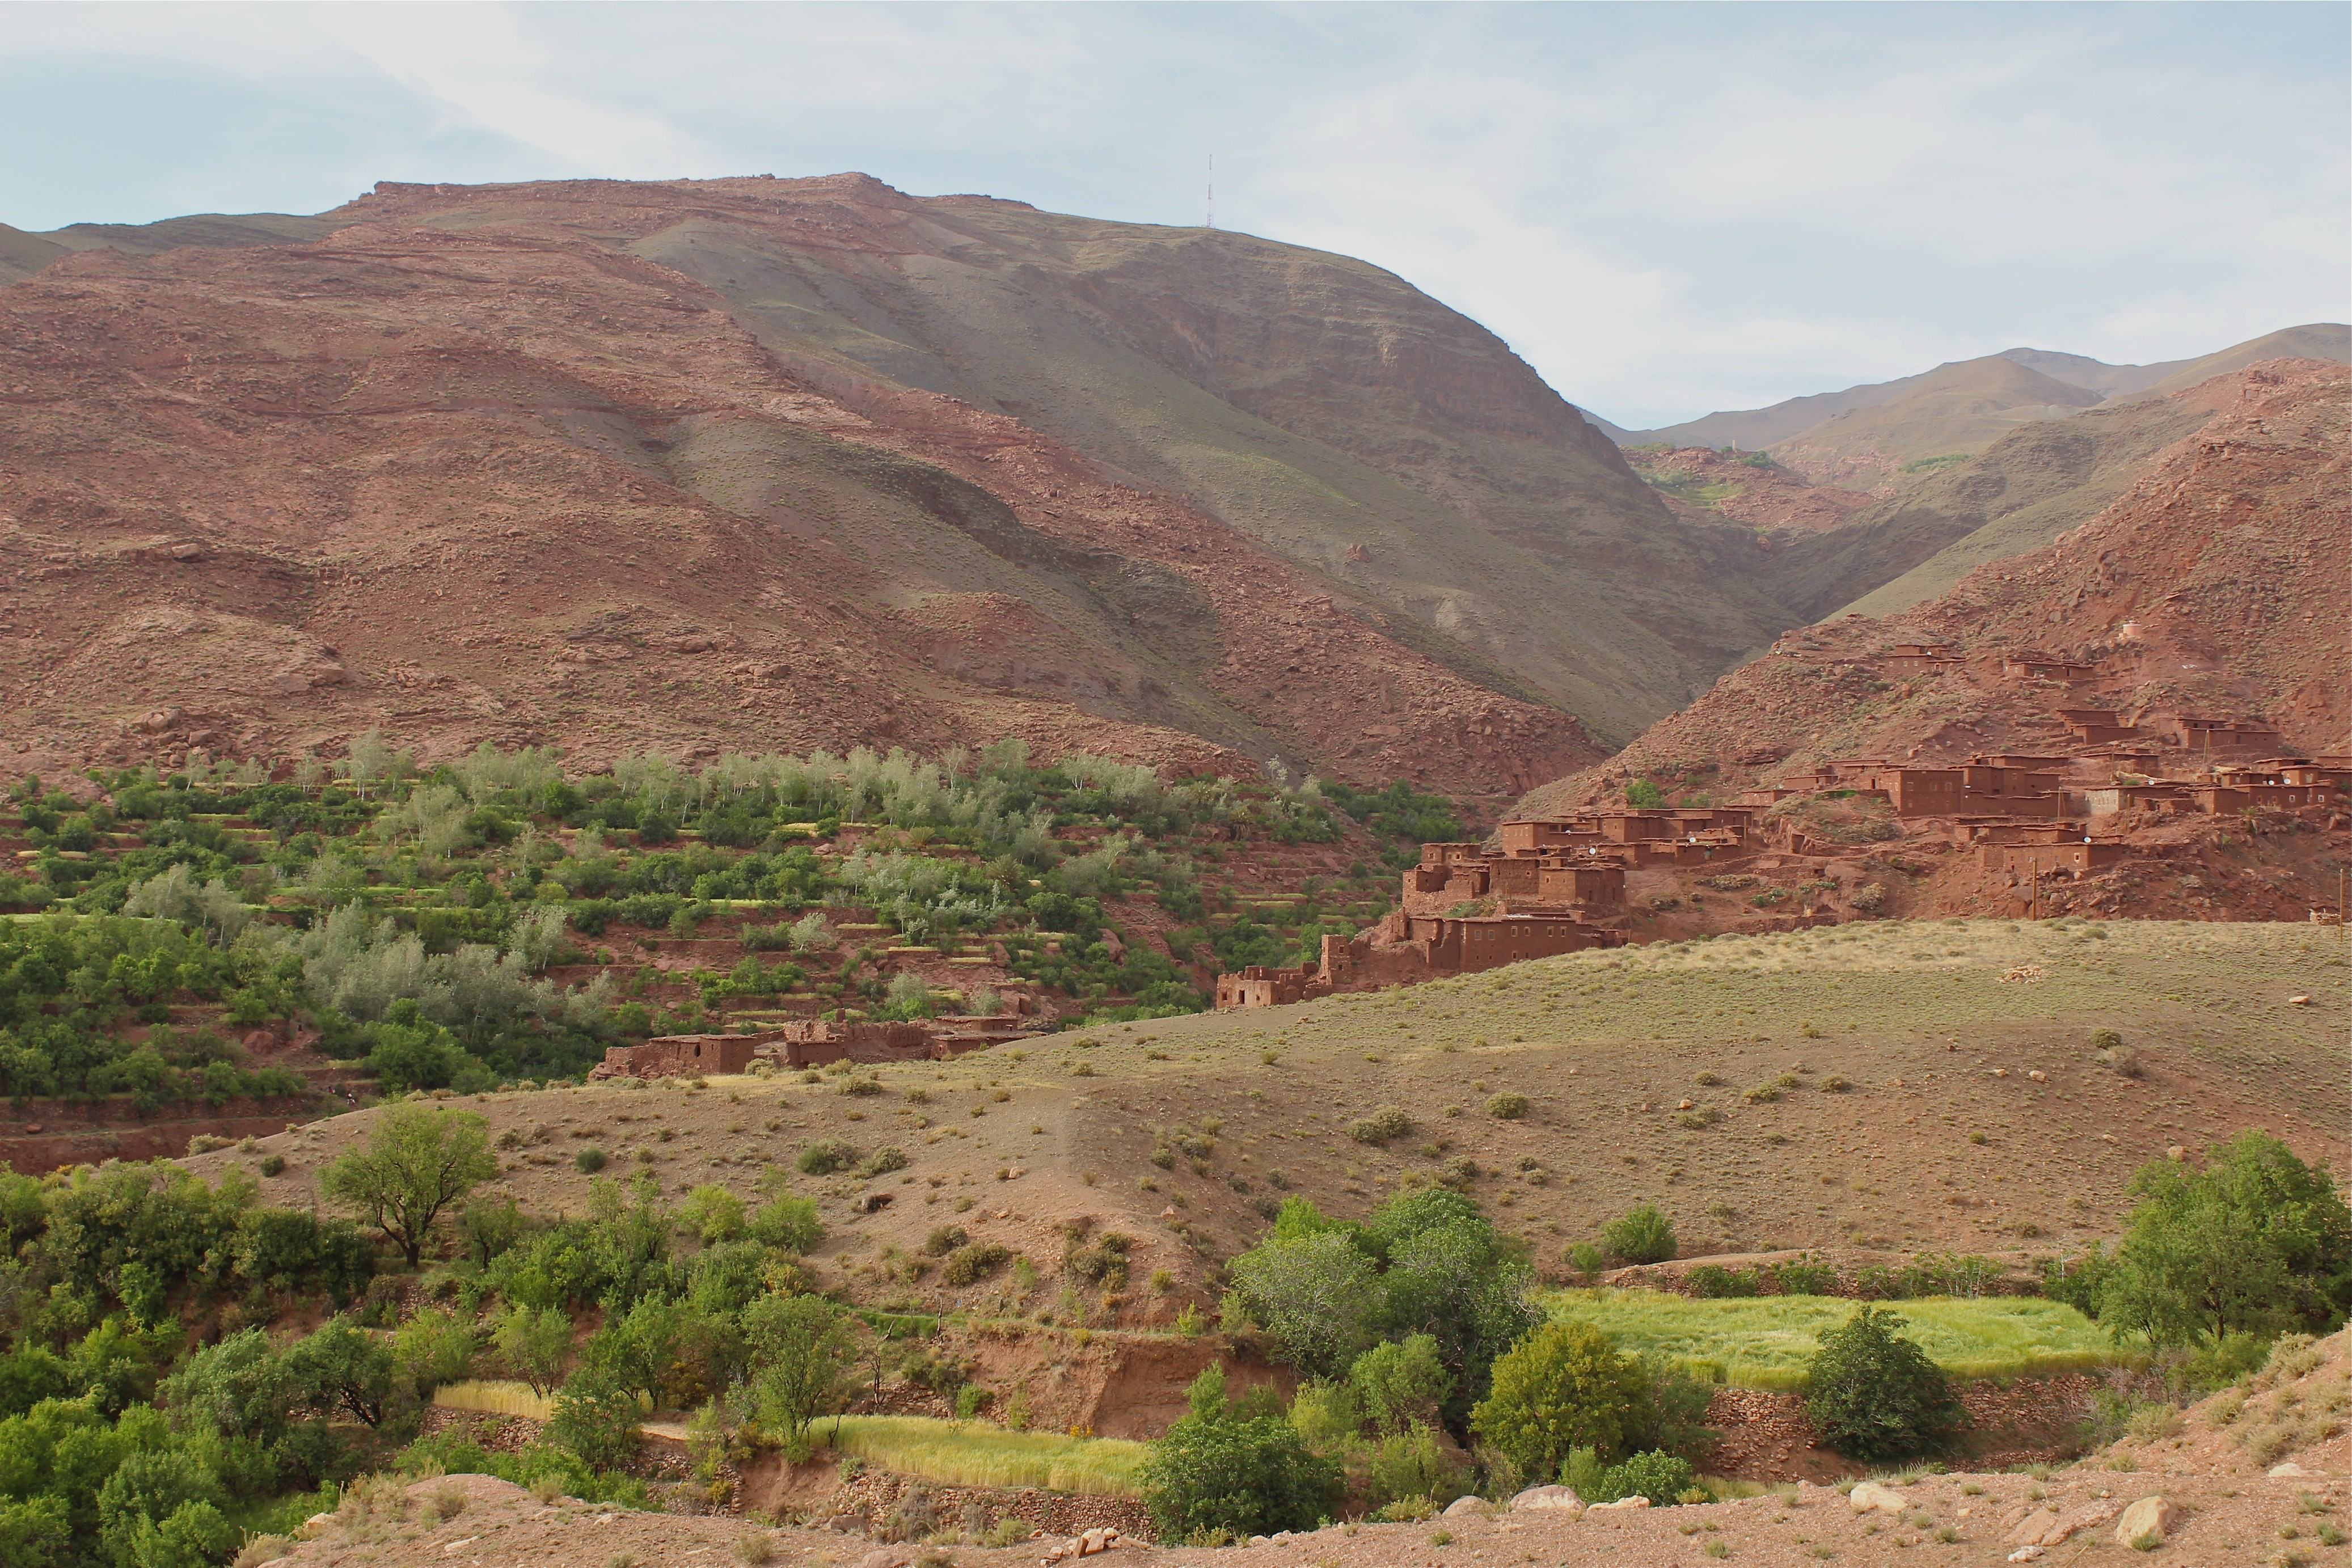 Berber village in the High Atlas mountains, Morocco